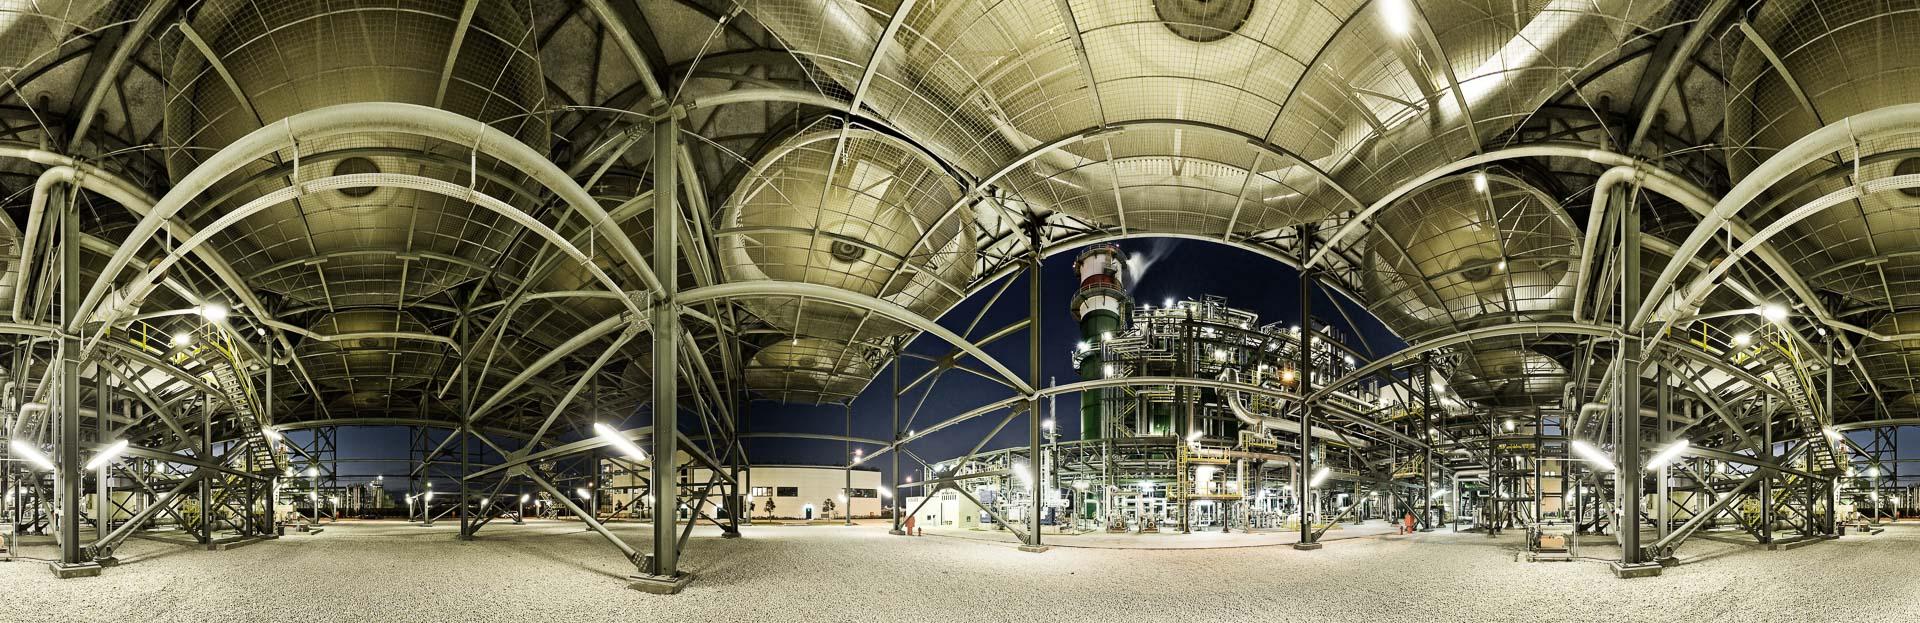 Gas Industrie Ventilatoren – 360° Foto